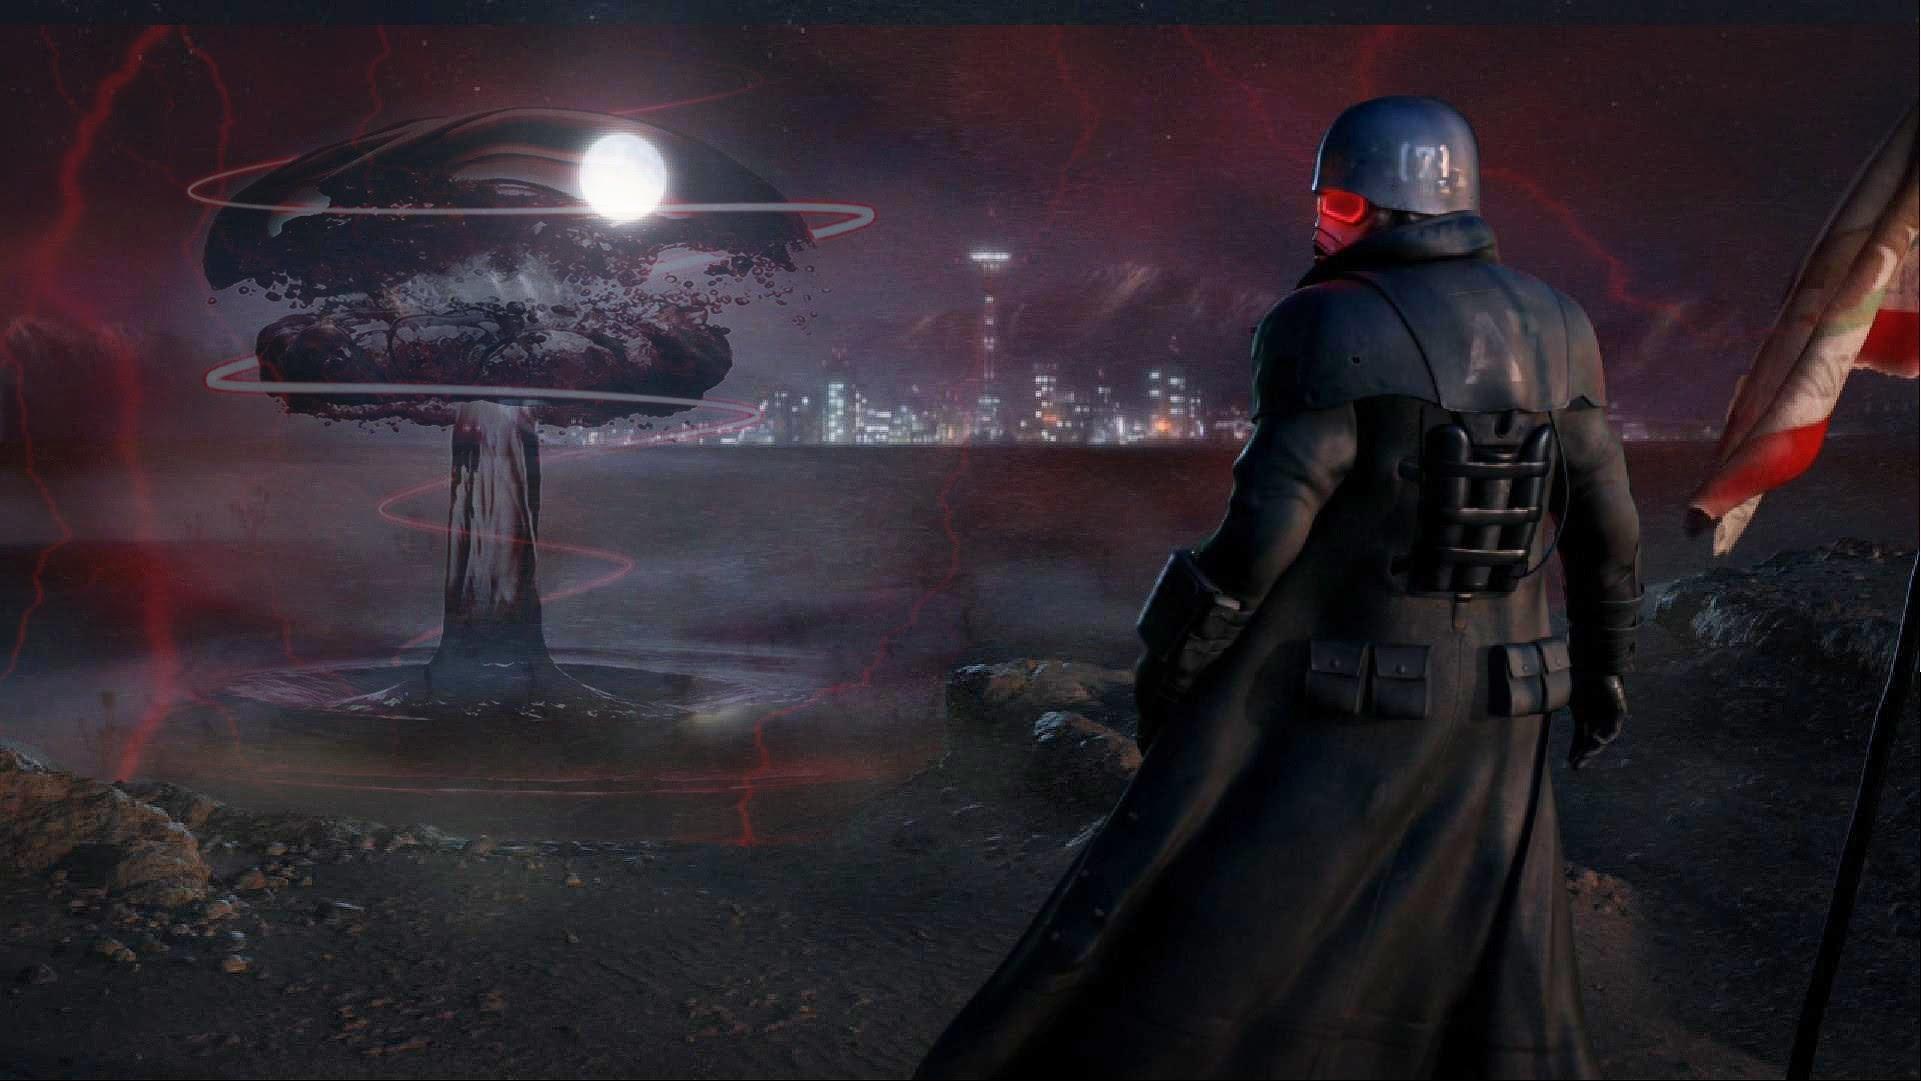 Hd Fallout New Vegas Wallpaper 82 Images